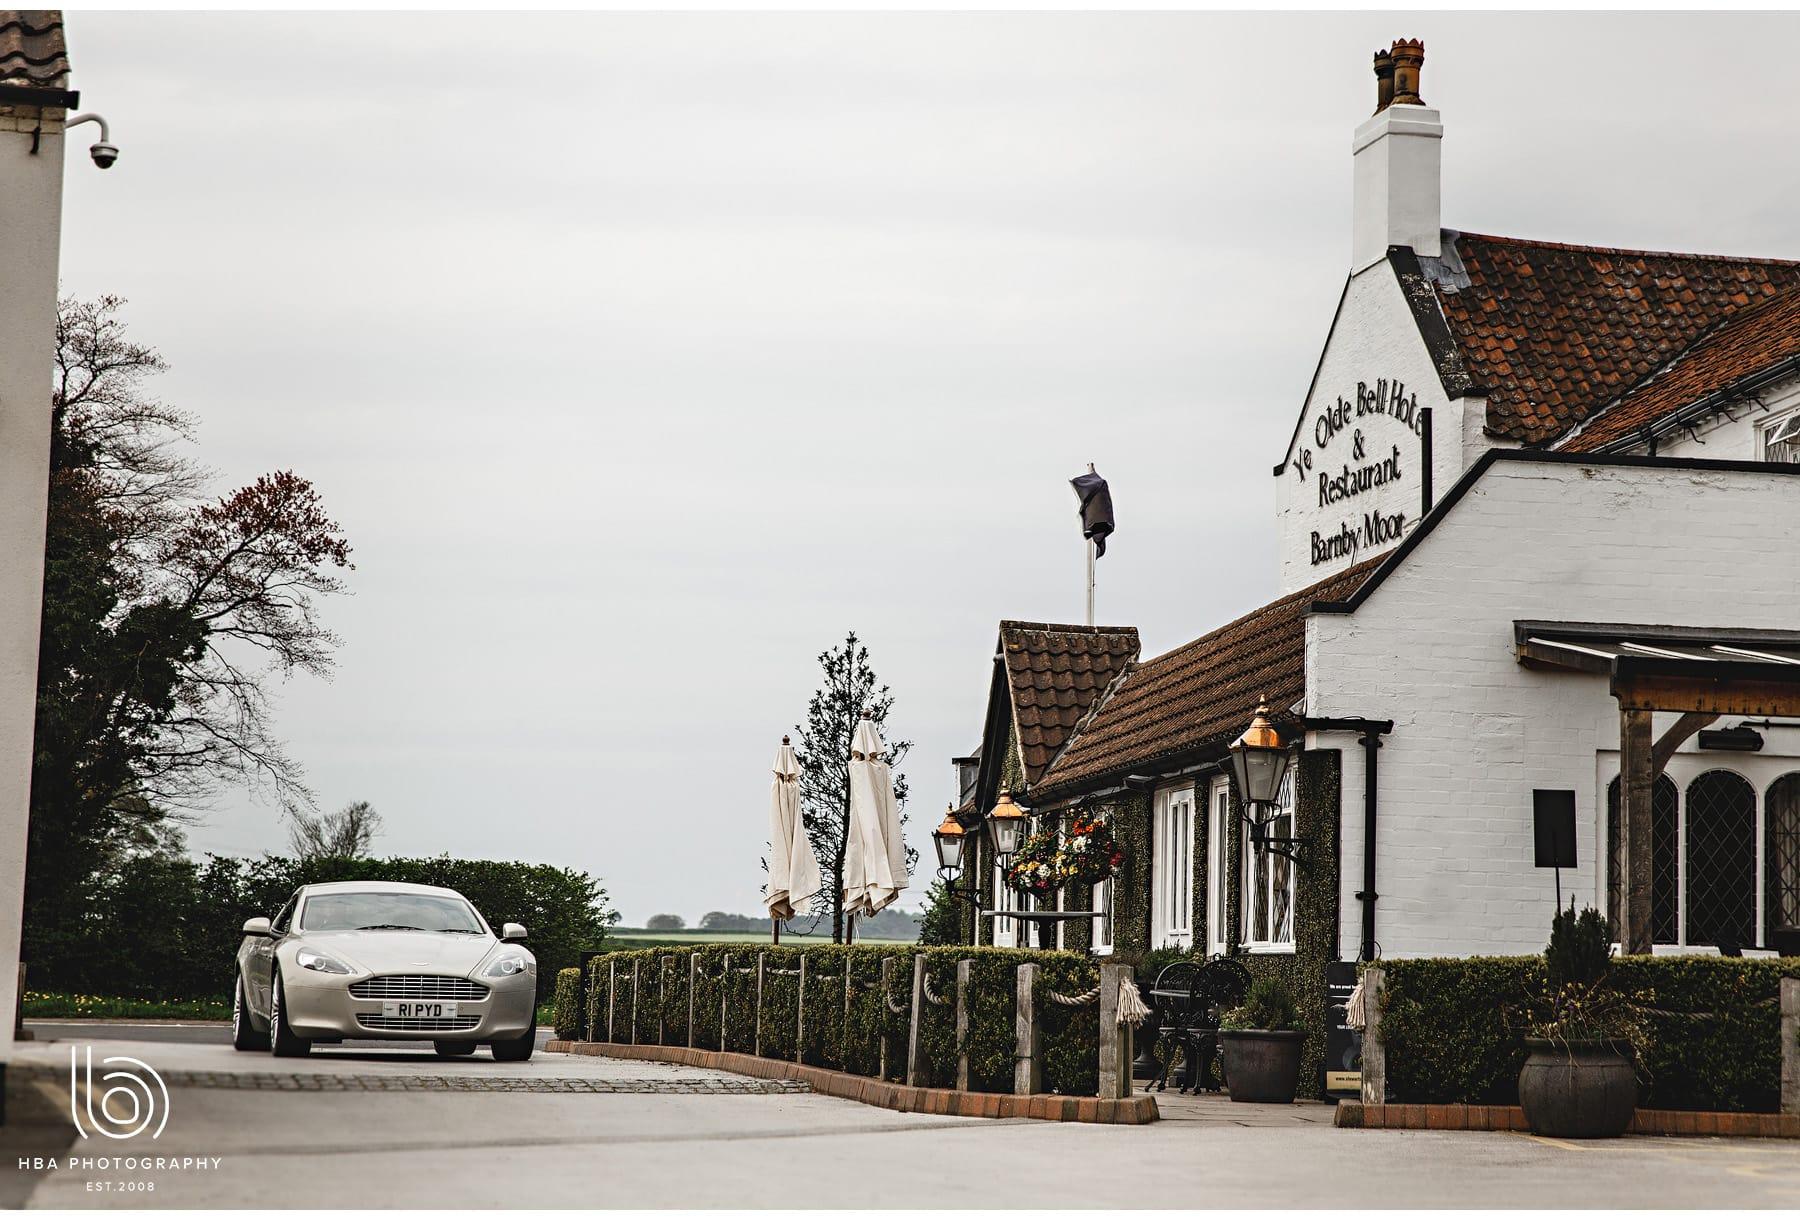 the Aston Martin arriving